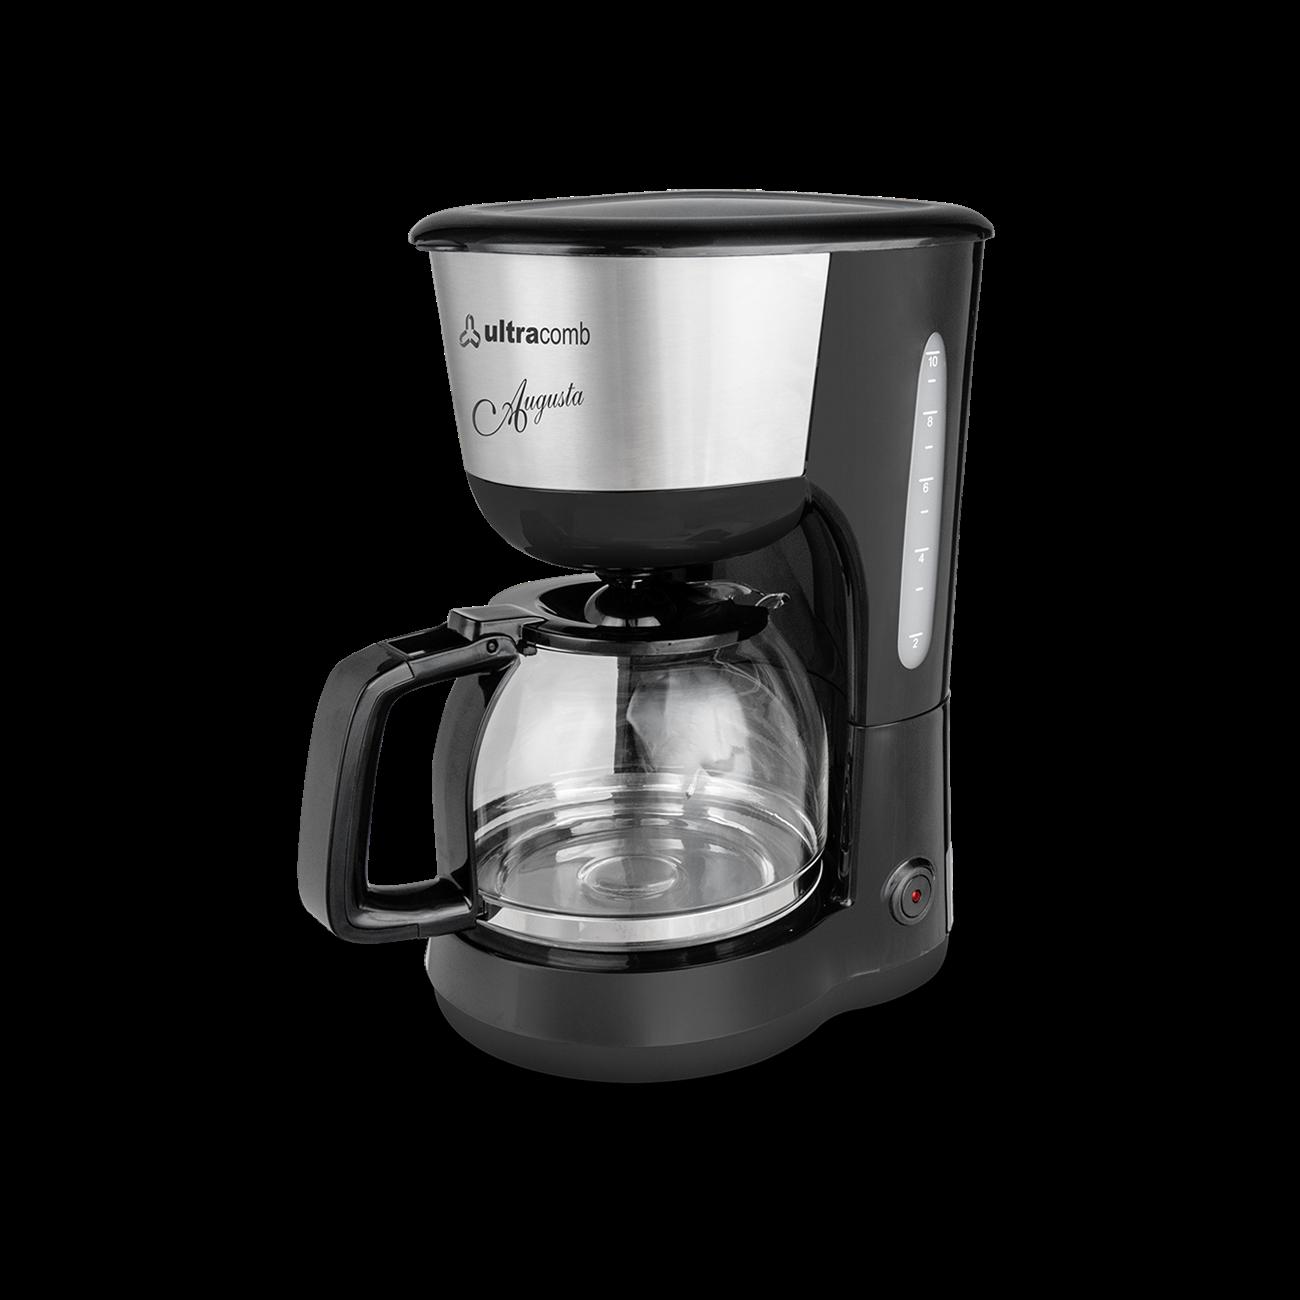 Cafetera Automatica Ultracomb CA 2208